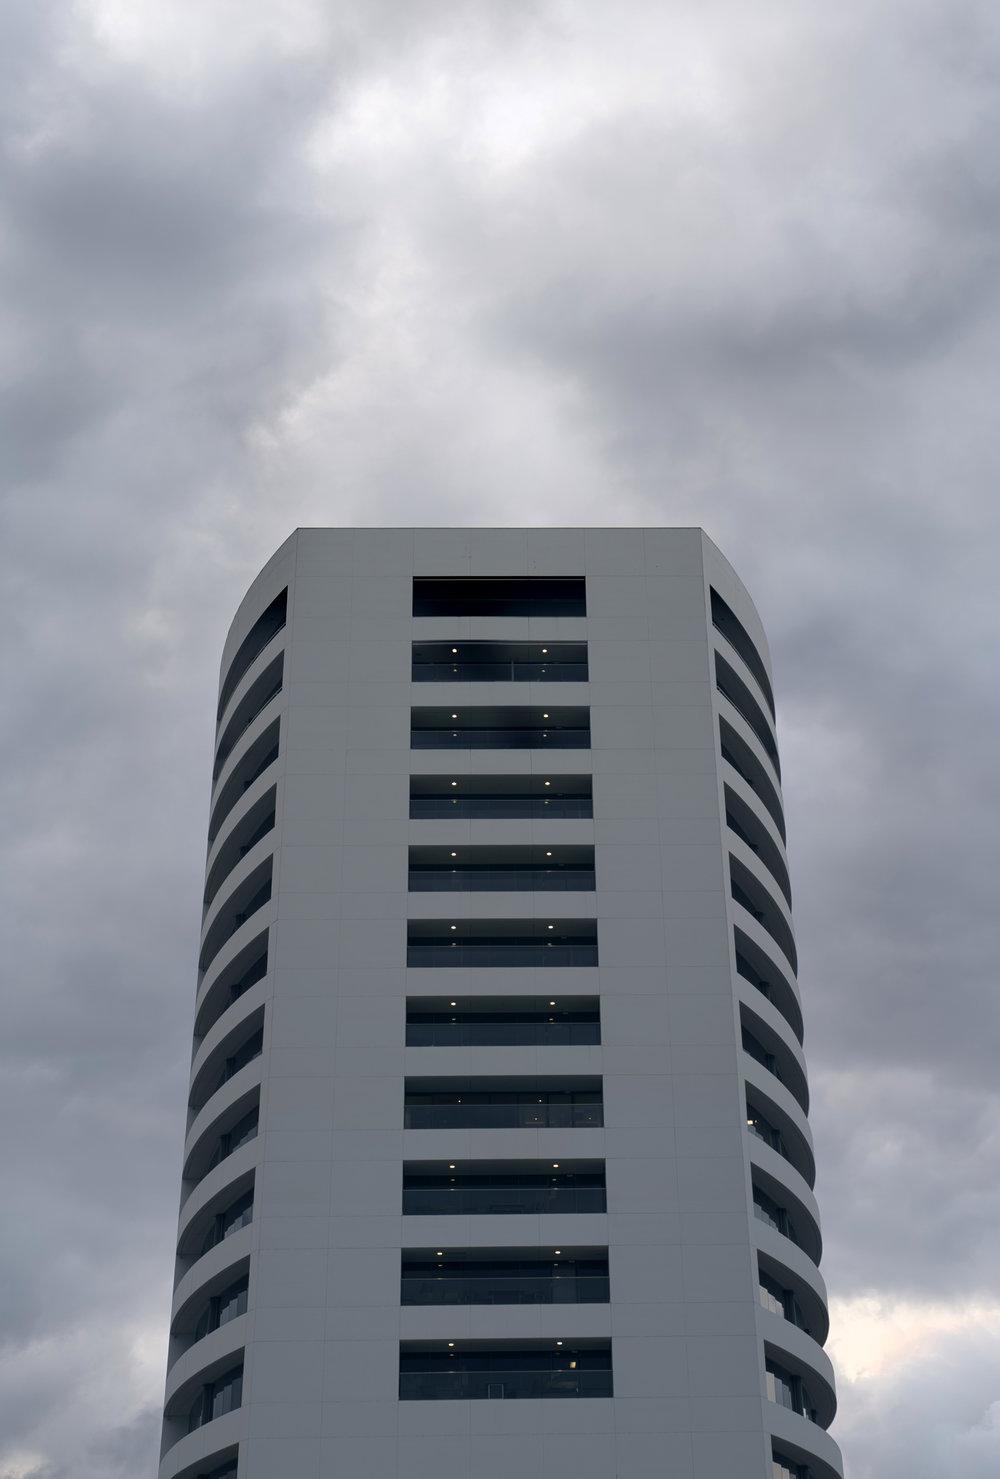 The Natual Mutual Tower